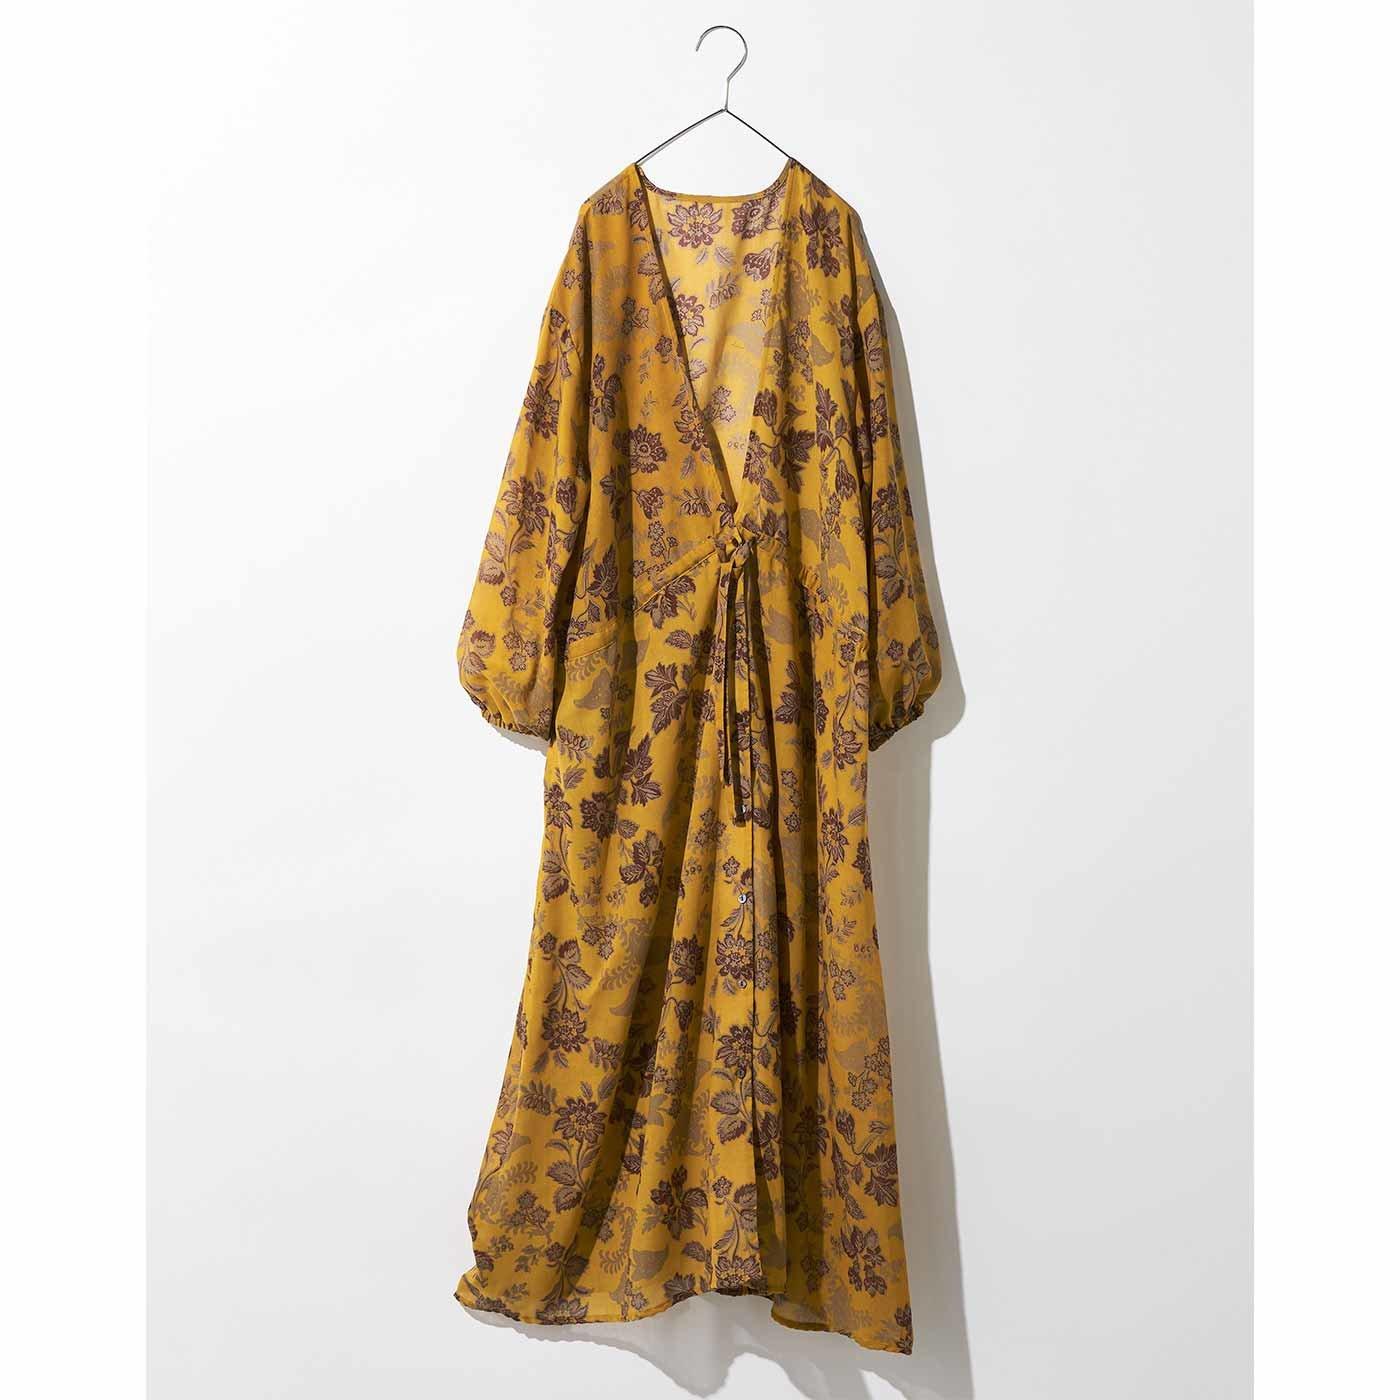 MEDE19F ヴィンテージパターンプリント 羽織りワンピース〈マスタード〉